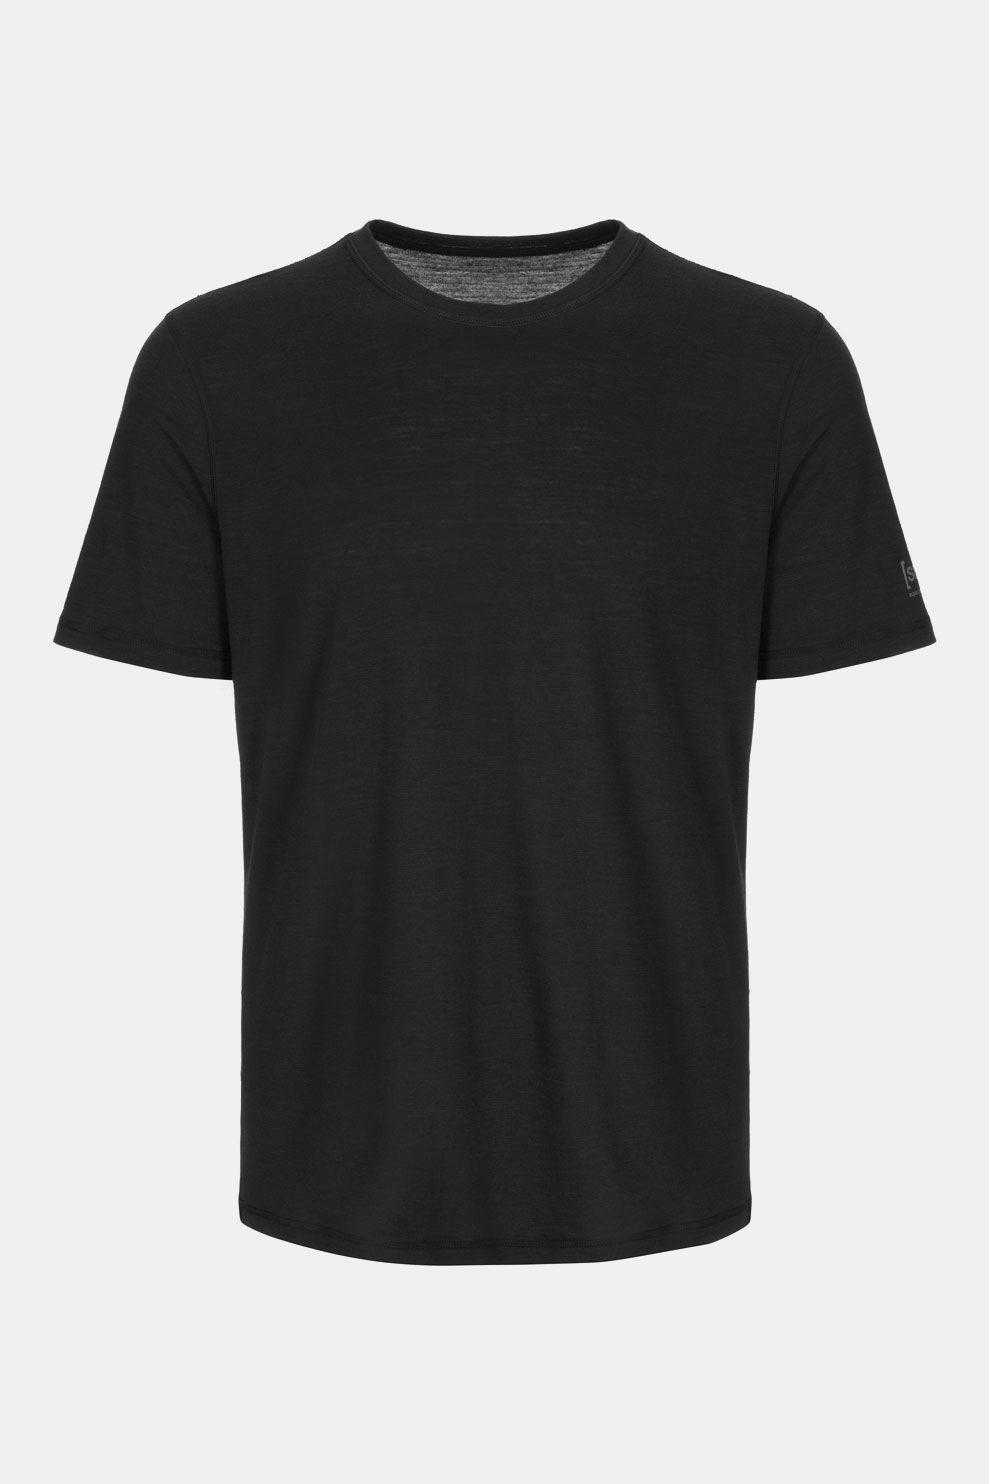 Supernatural Base Tee 140 T-shirt Donkergrijs